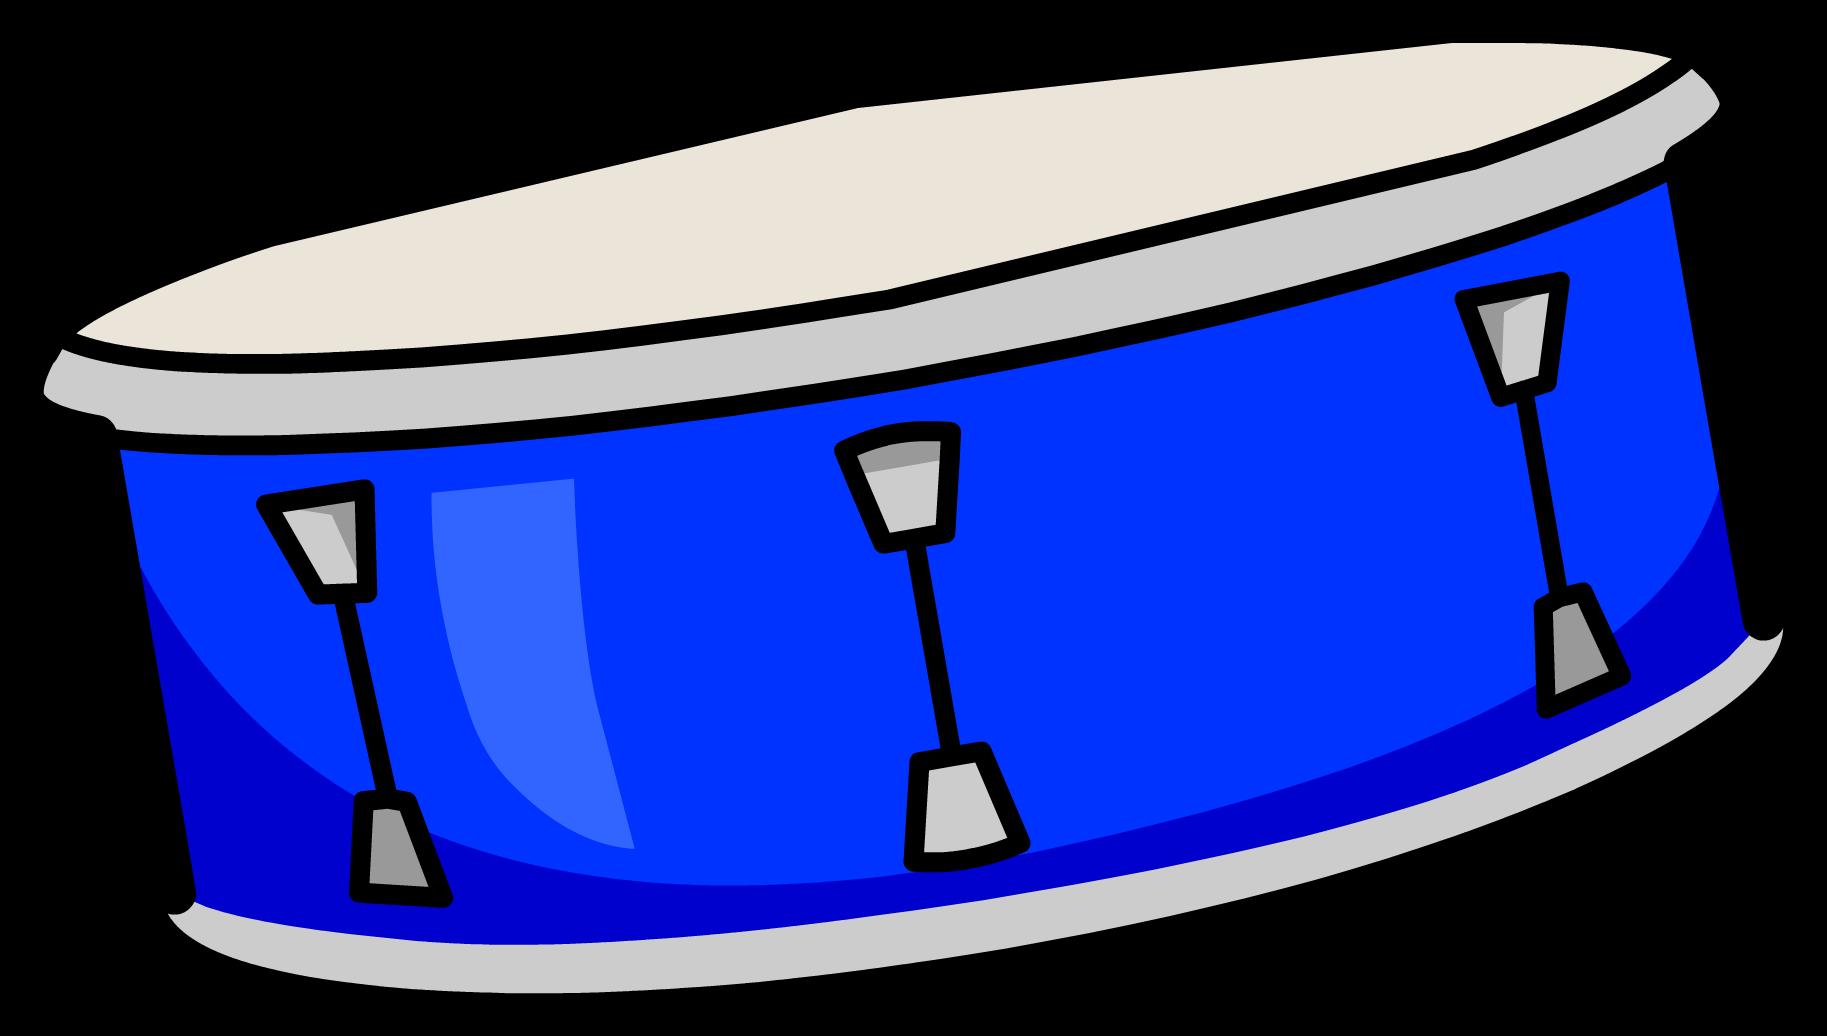 Blue Snare Drum